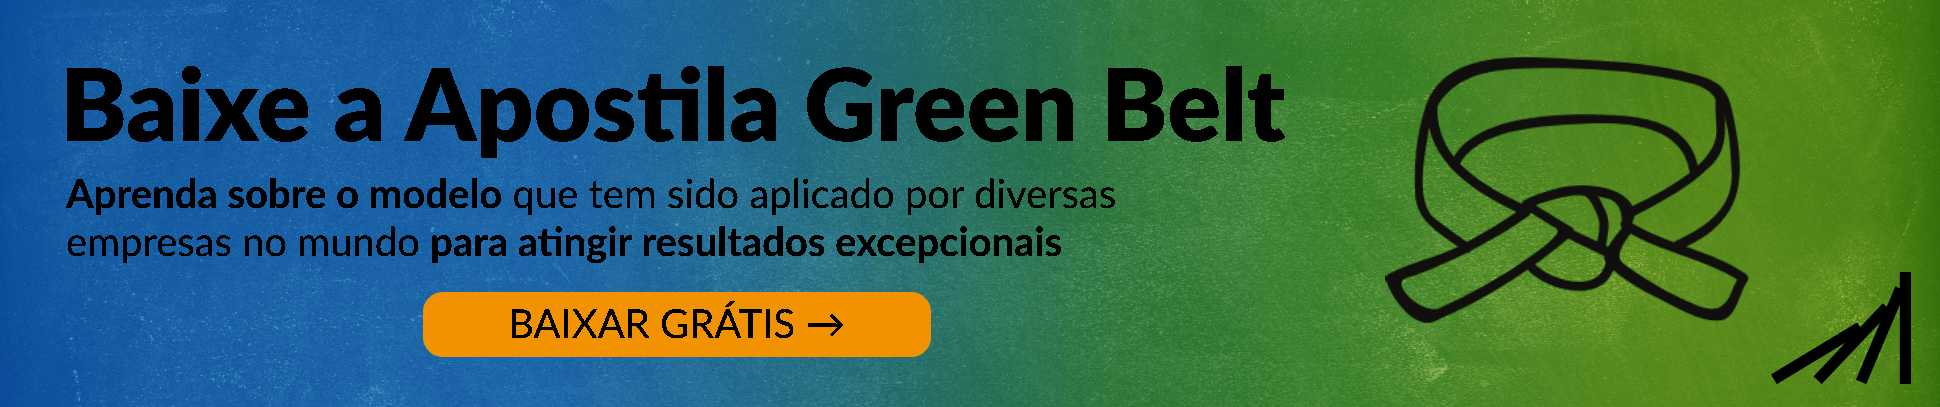 Apostila Green Belt